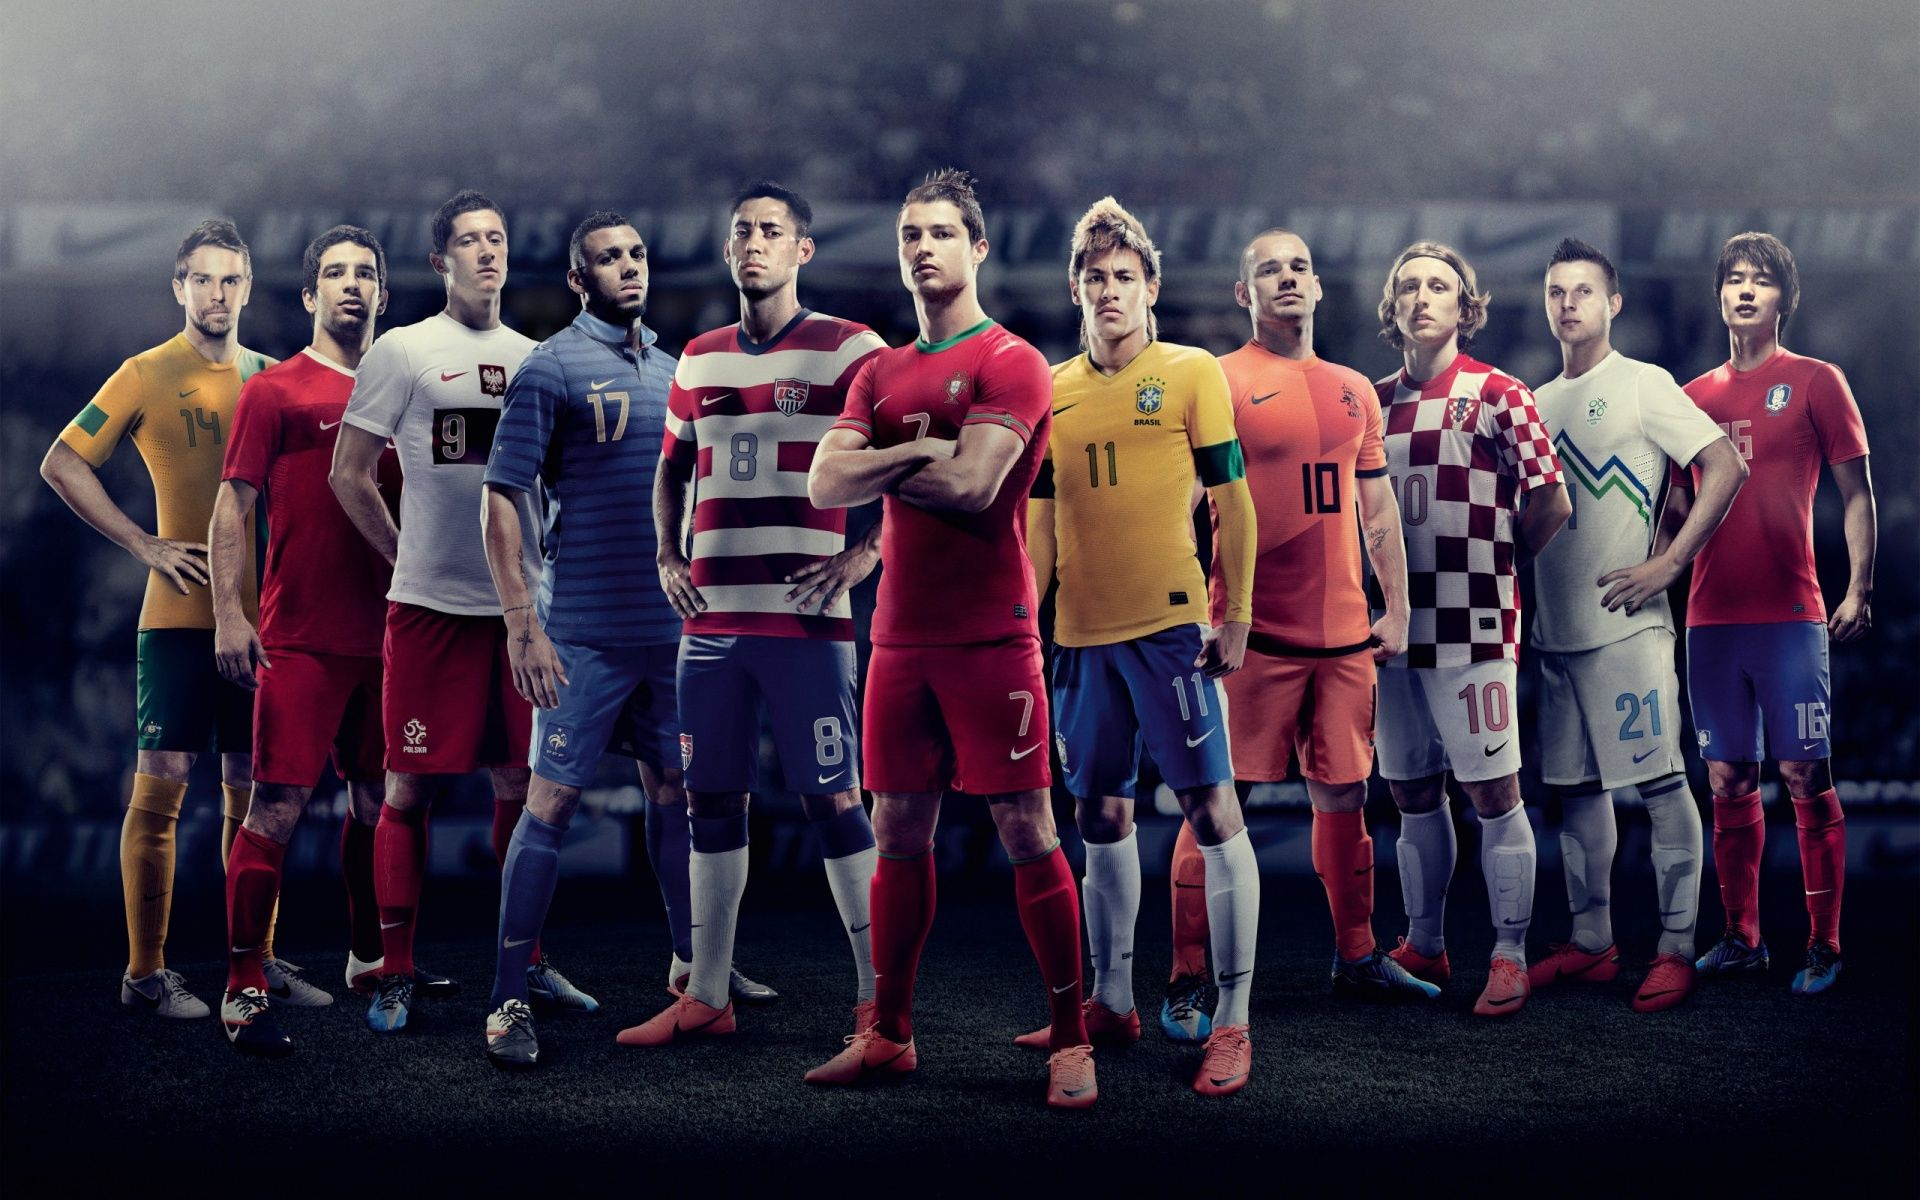 Football Players Hd Background 9 HD Wallpapers My Stuff 1920x1200